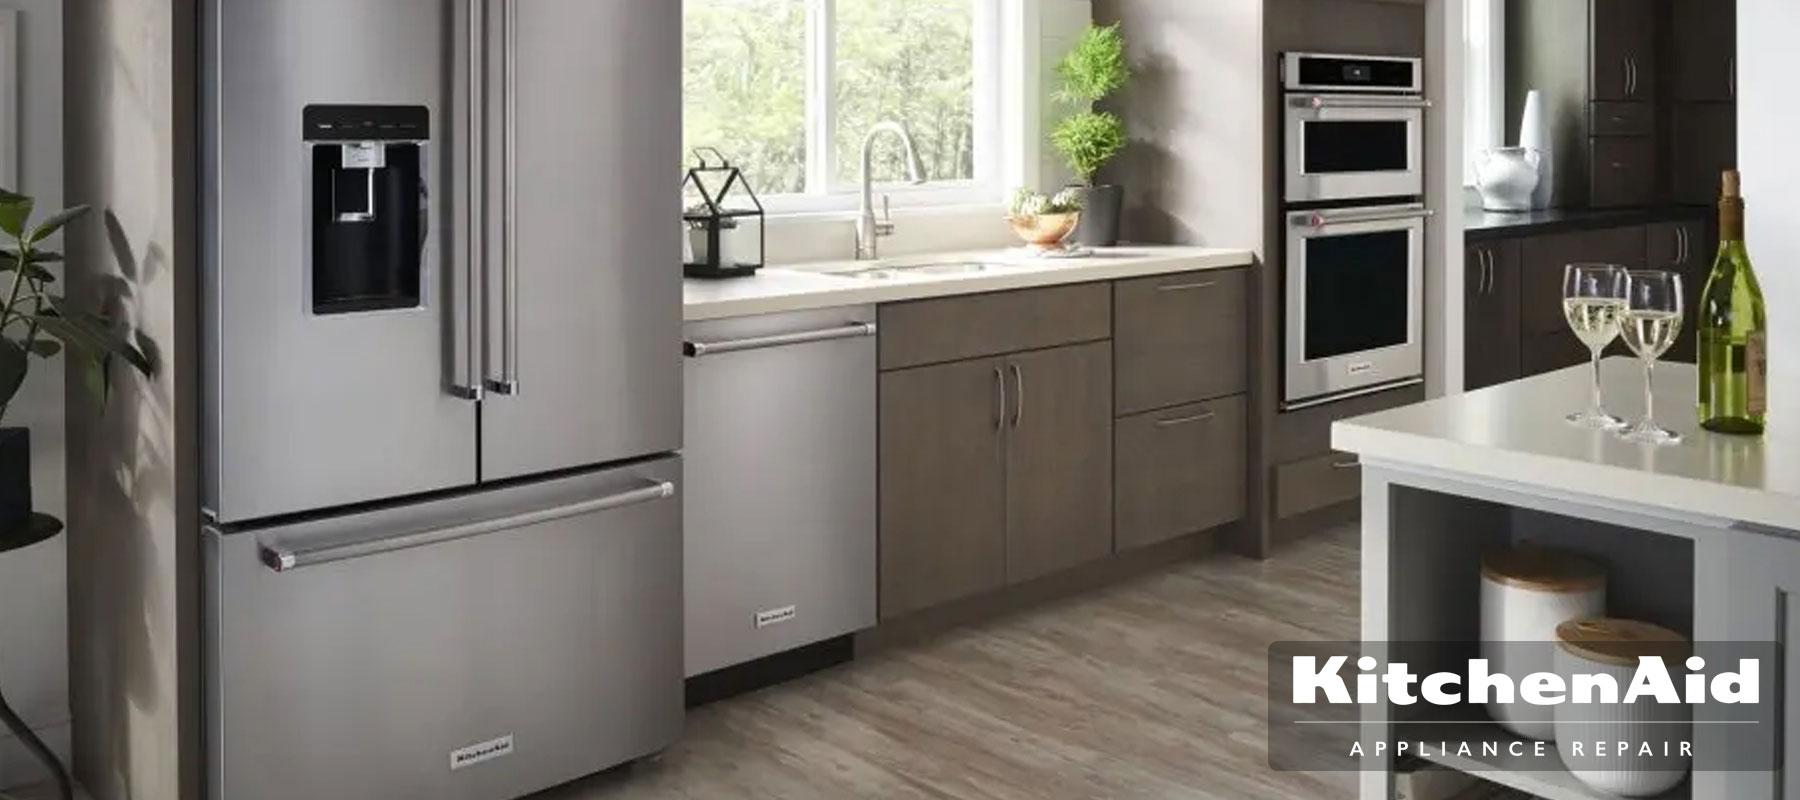 Common Types of KitchenAid Refrigerator Noise | KitchenAid Appliance Repair Professionals